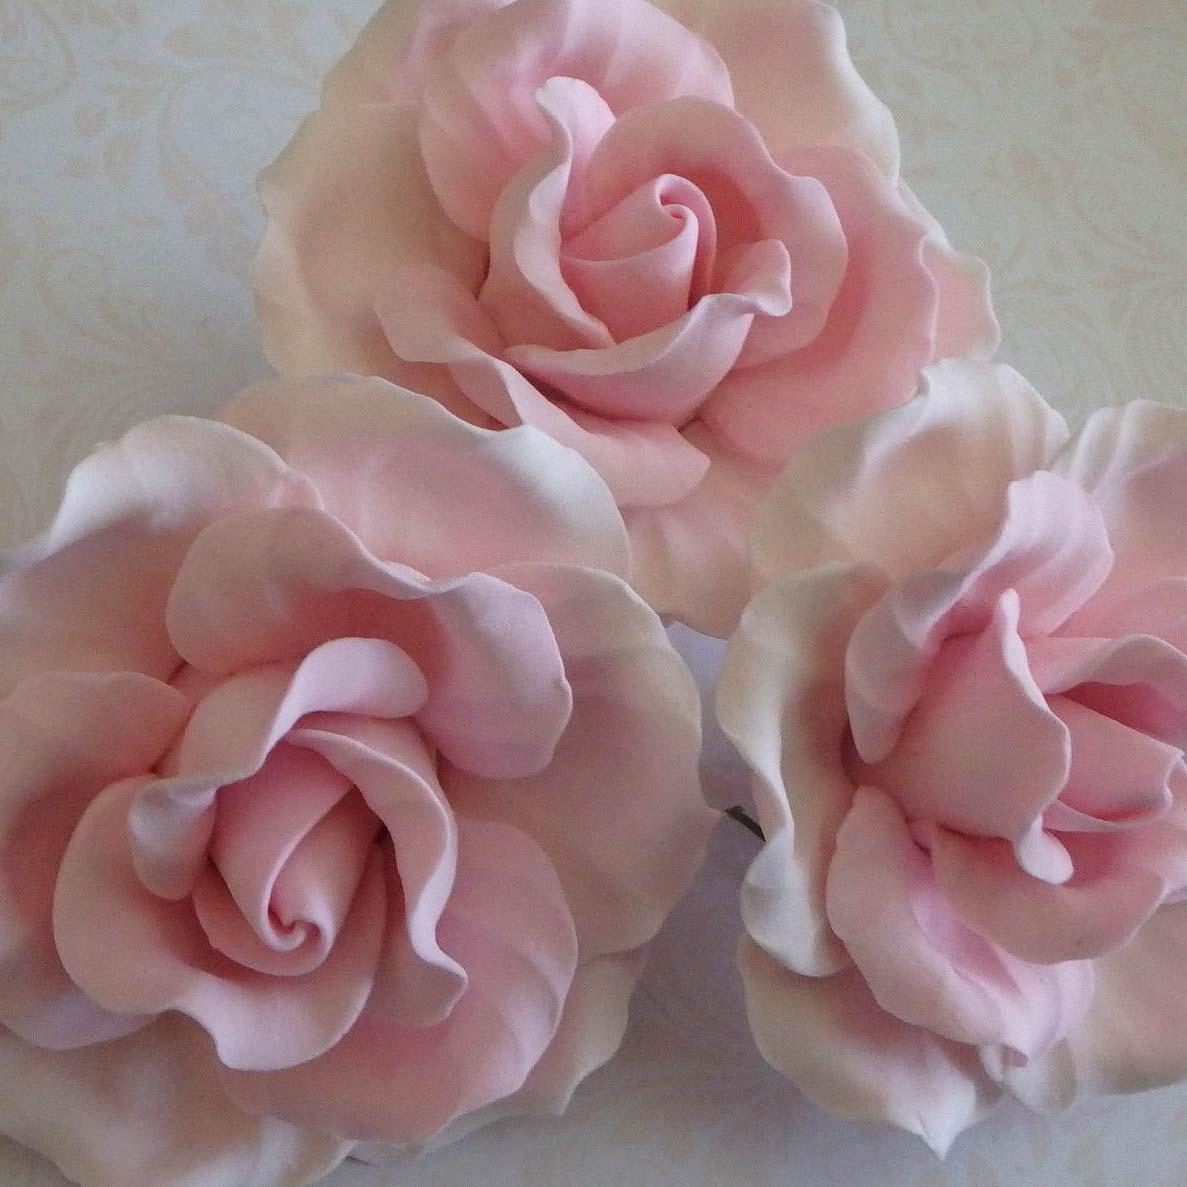 3 Large Roses Sugar flowers wedding birthday cake ...